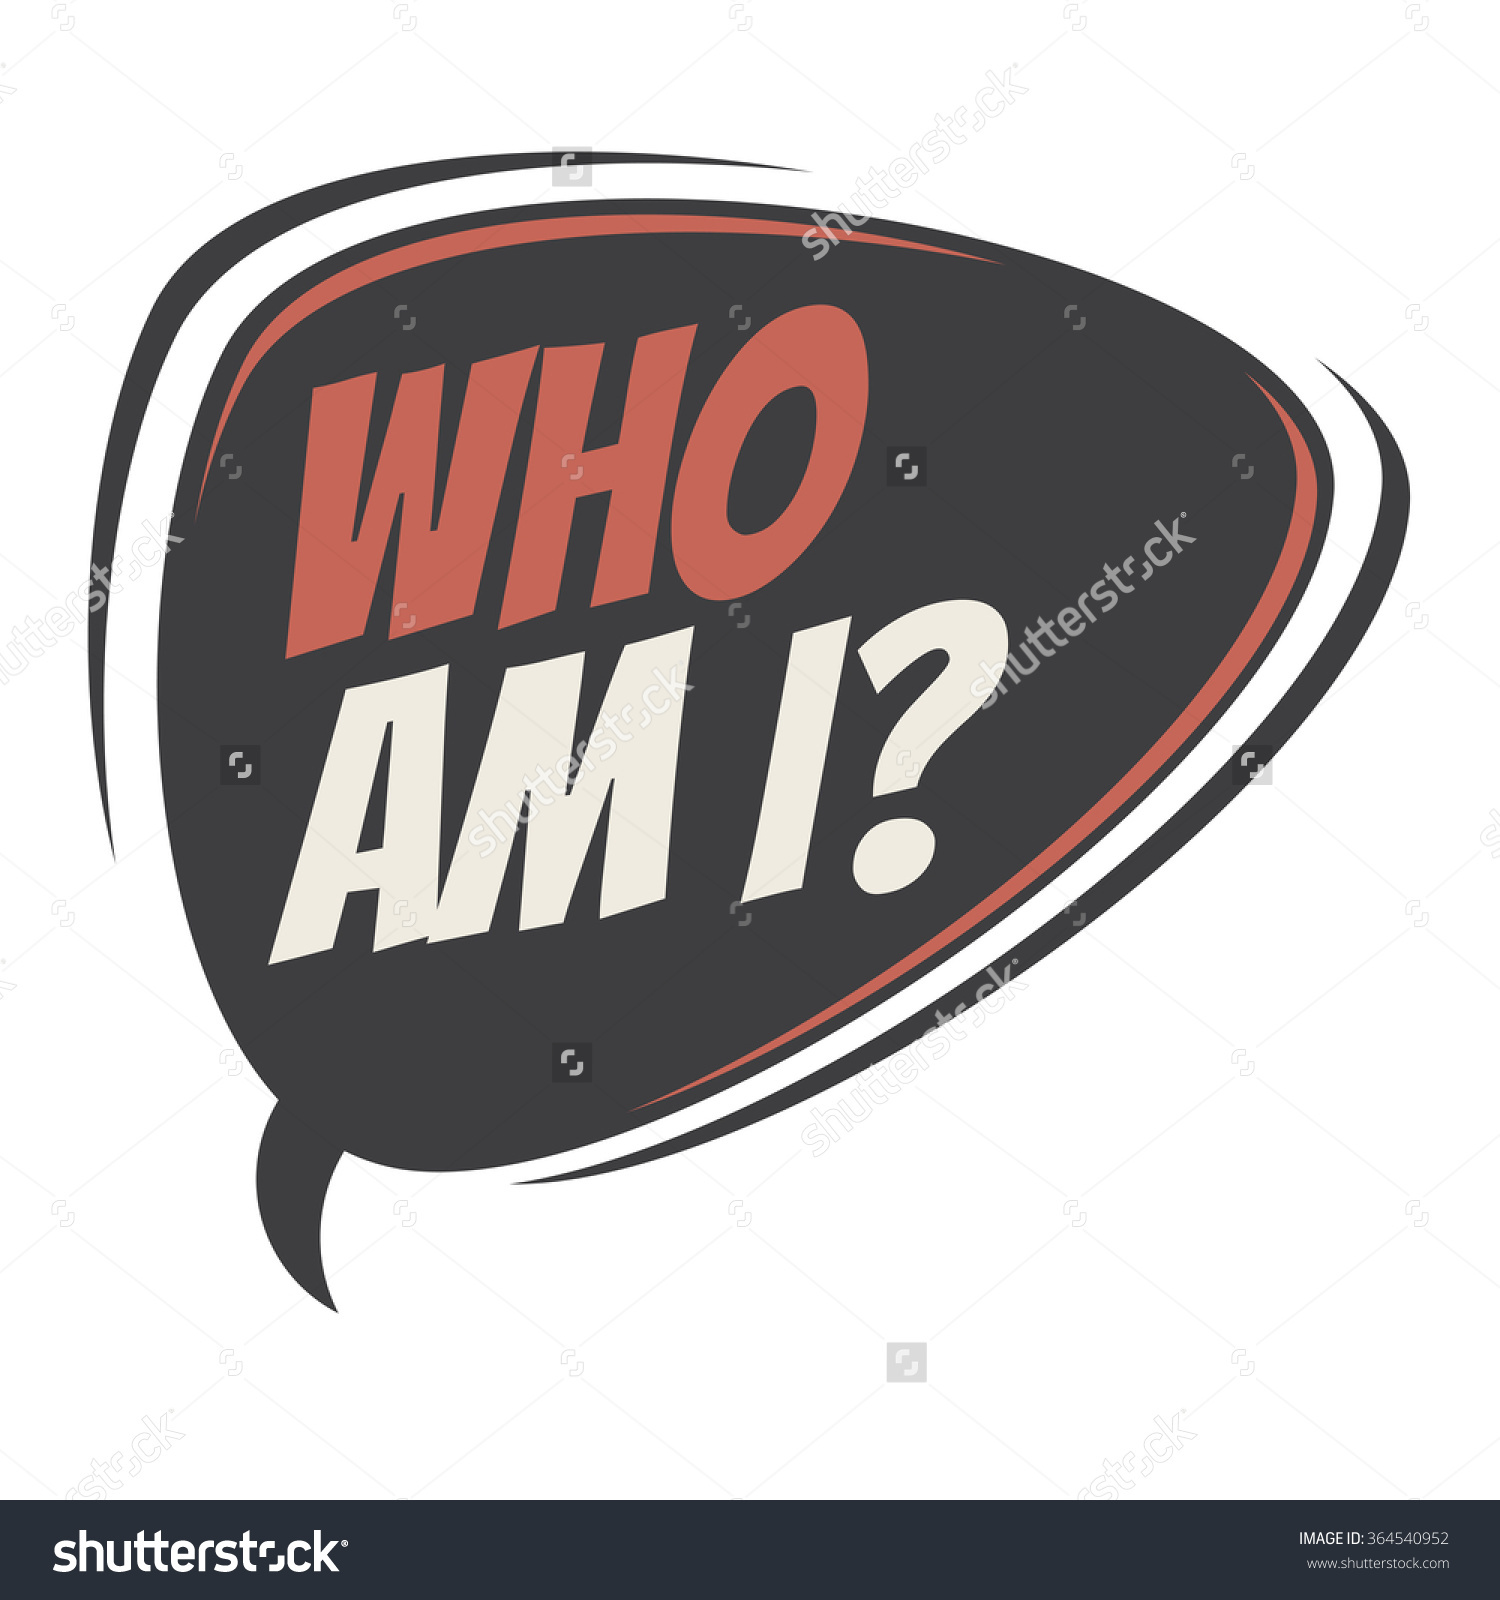 Who Am I Clipart.